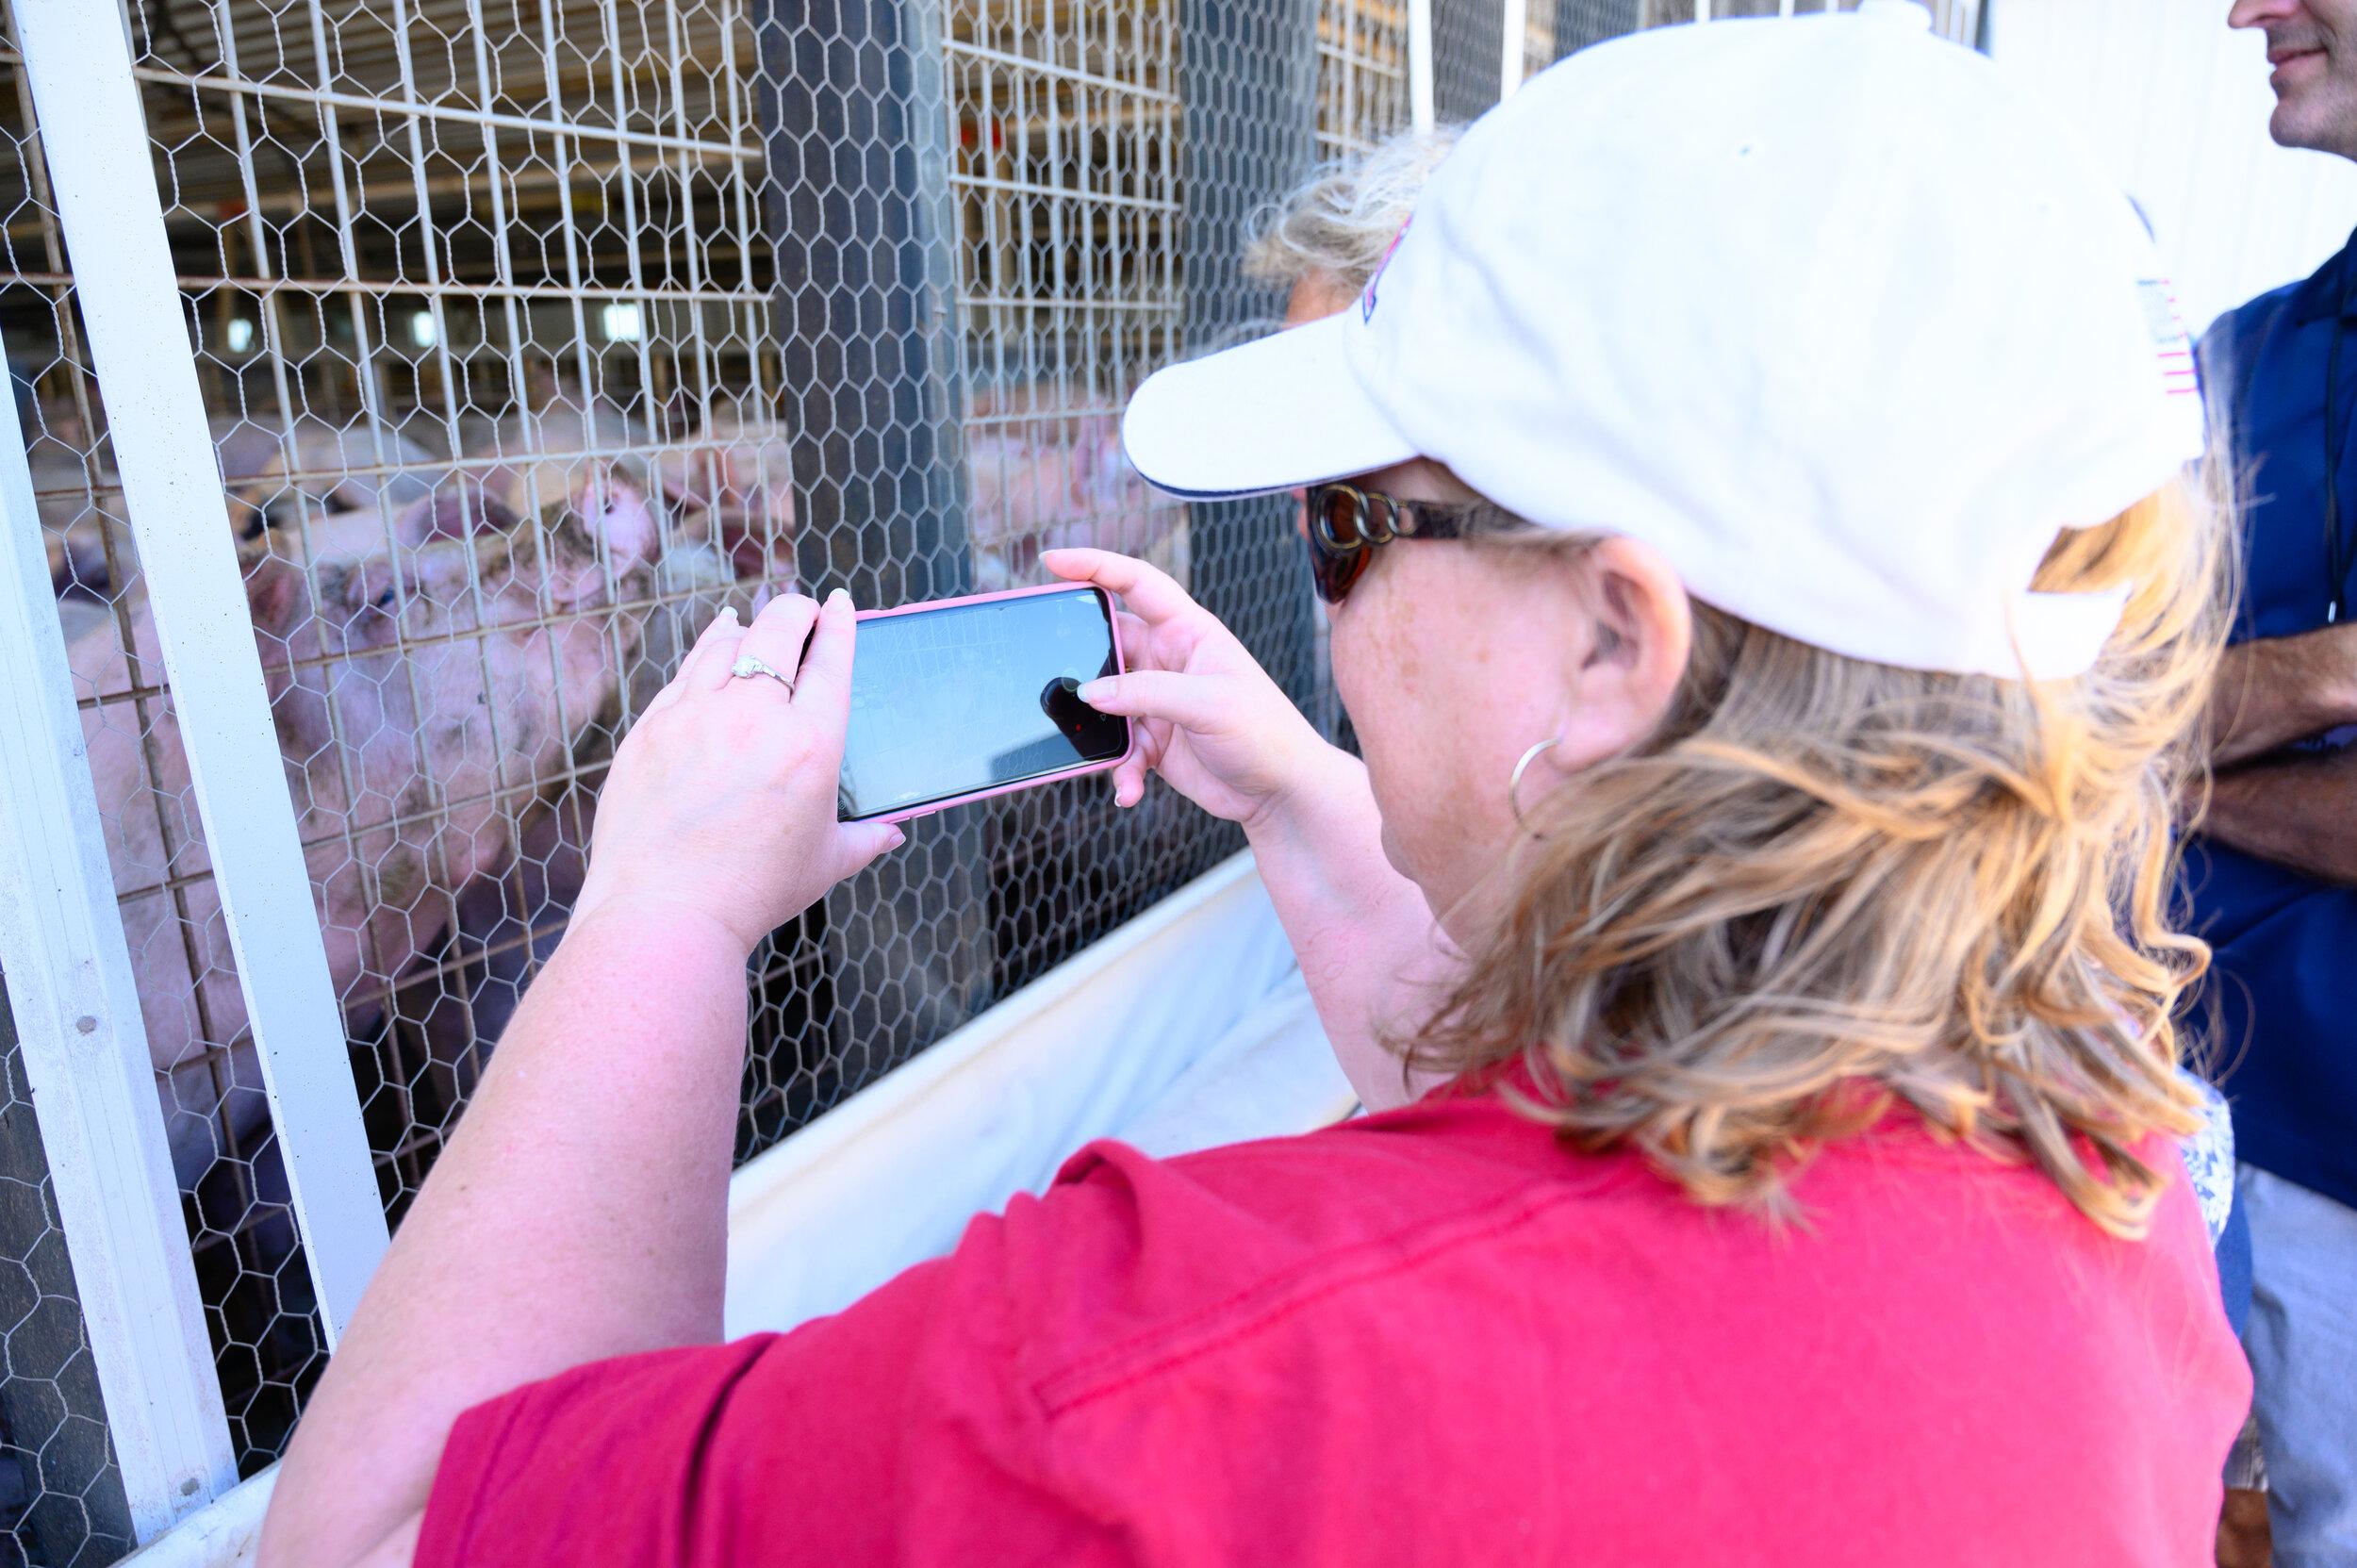 Teresa Lane takes a photo of pigs at Jonathan Wetter's farm. Photo credit: Joseph L. Murphy/Iowa Soybean Association